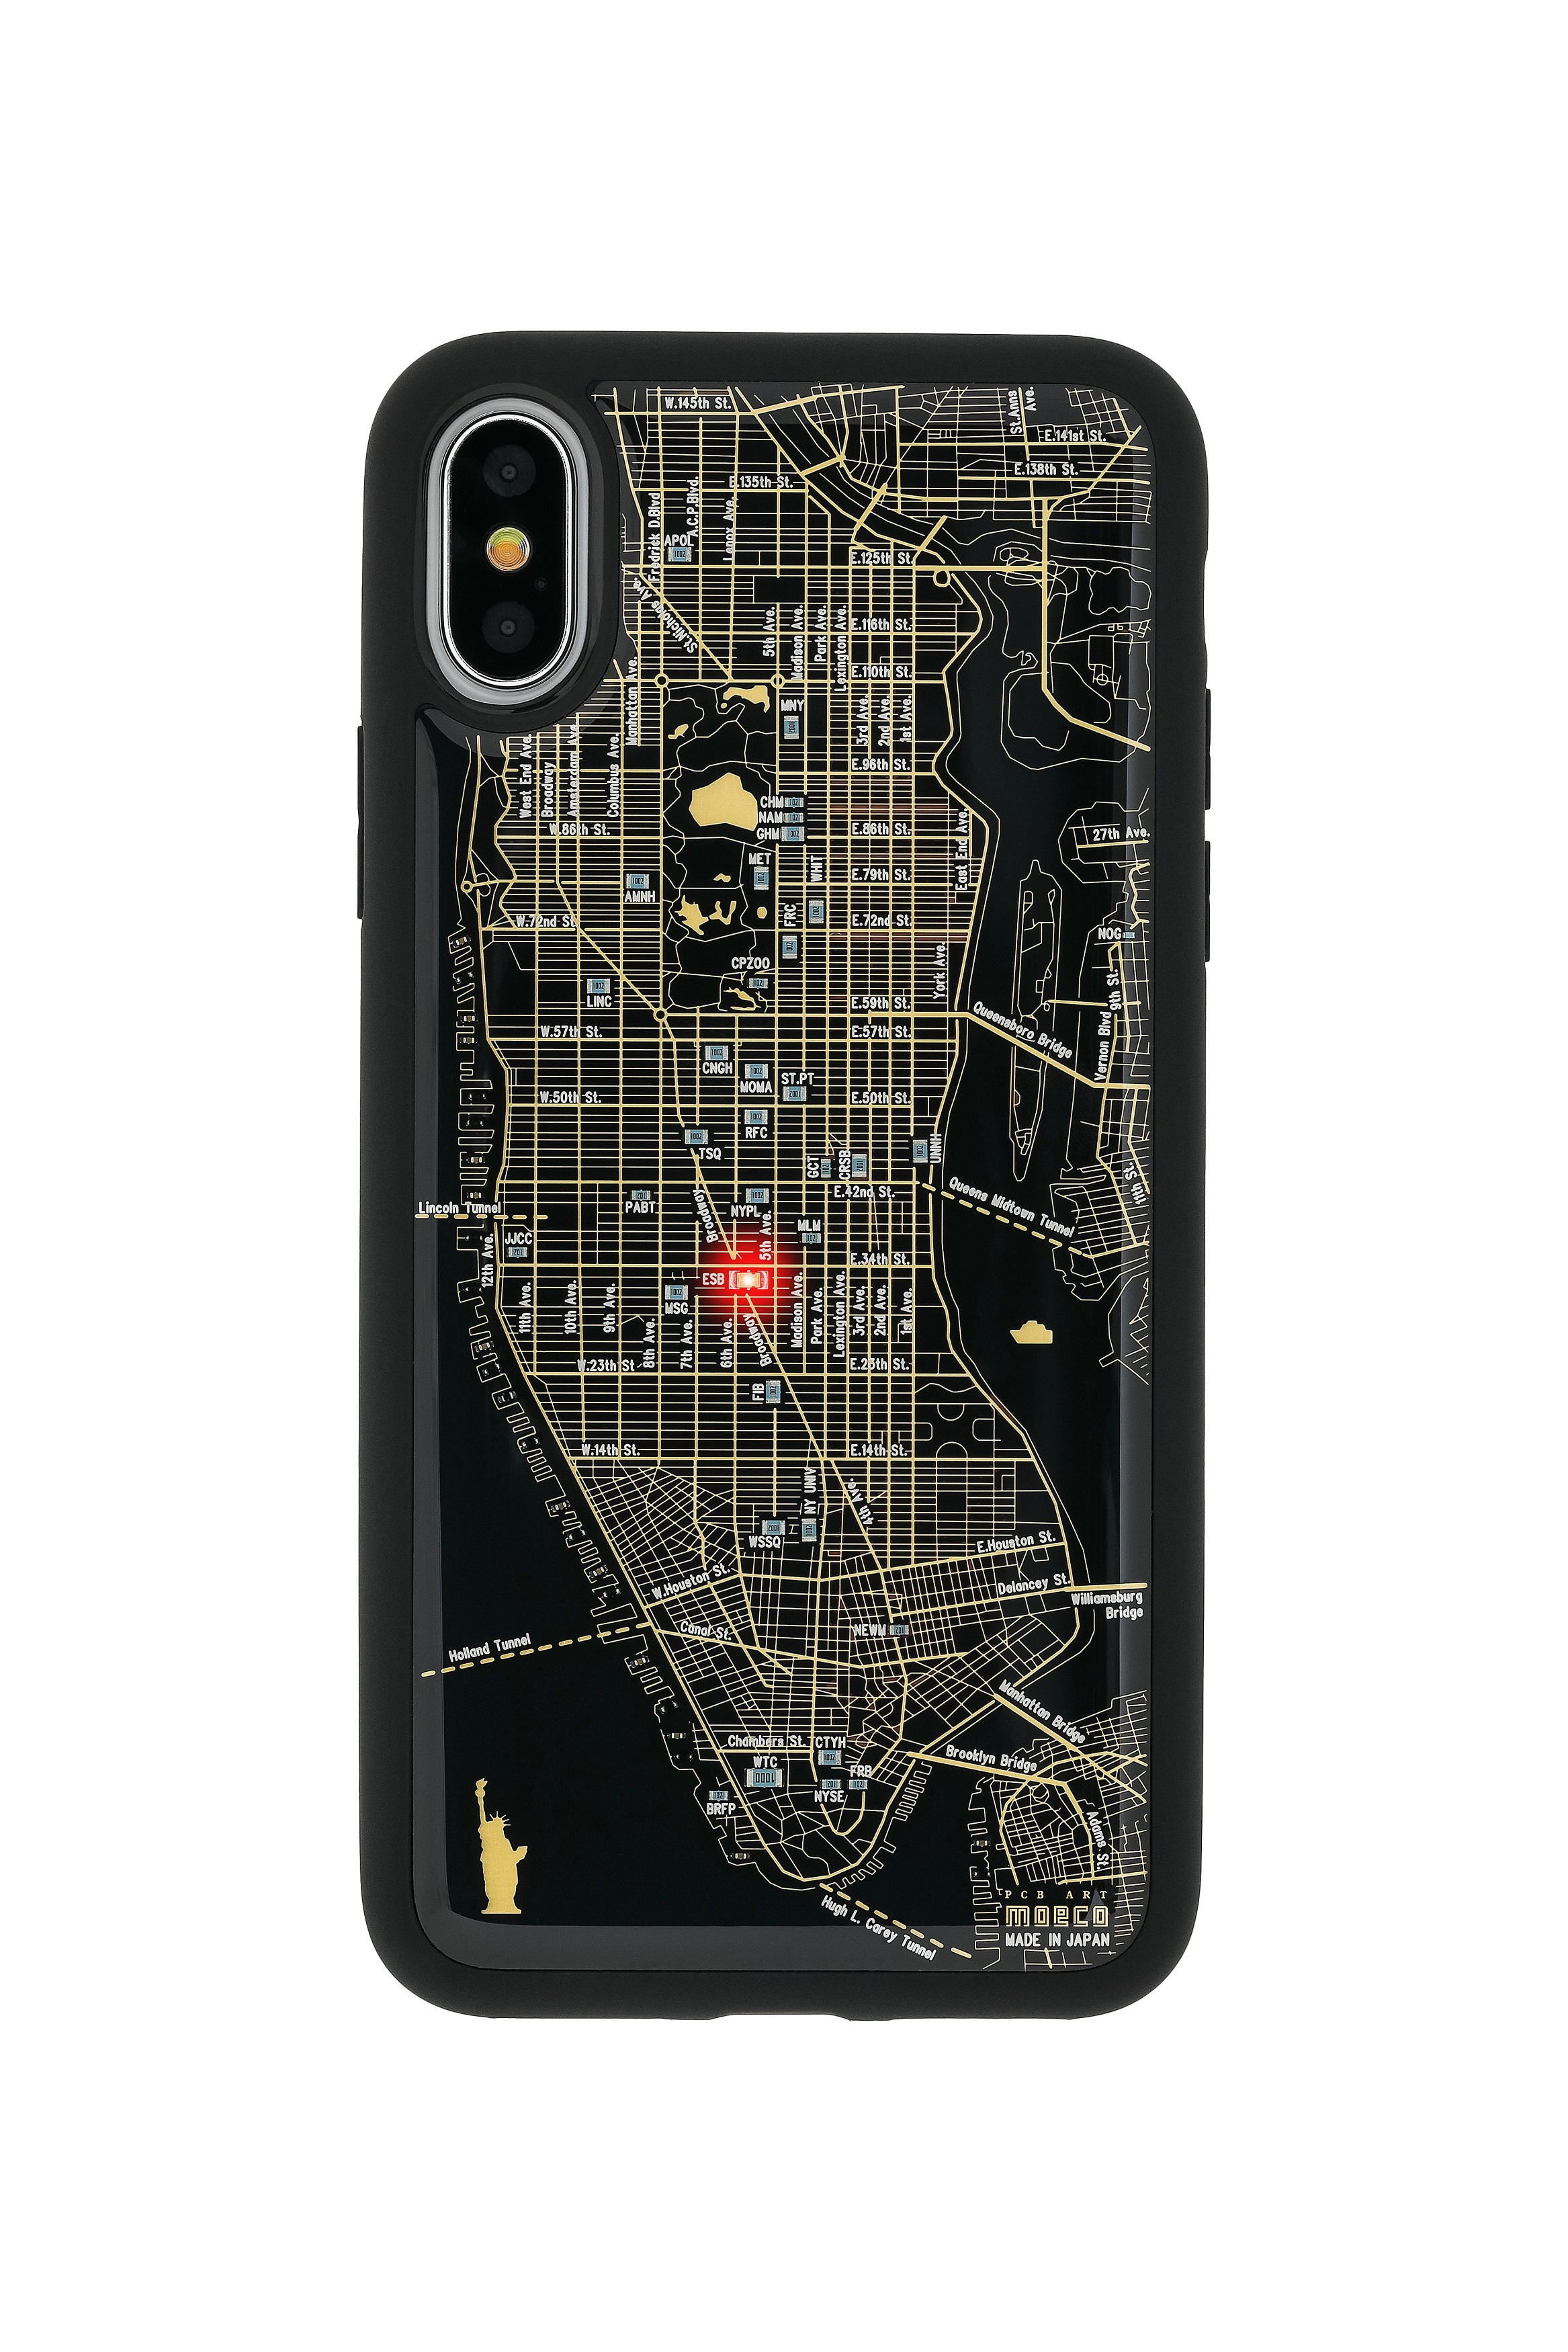 FLASH NY回路地図 iPhoneX/XSケース 黒【東京回路線図A5クリアファイルをプレゼント】